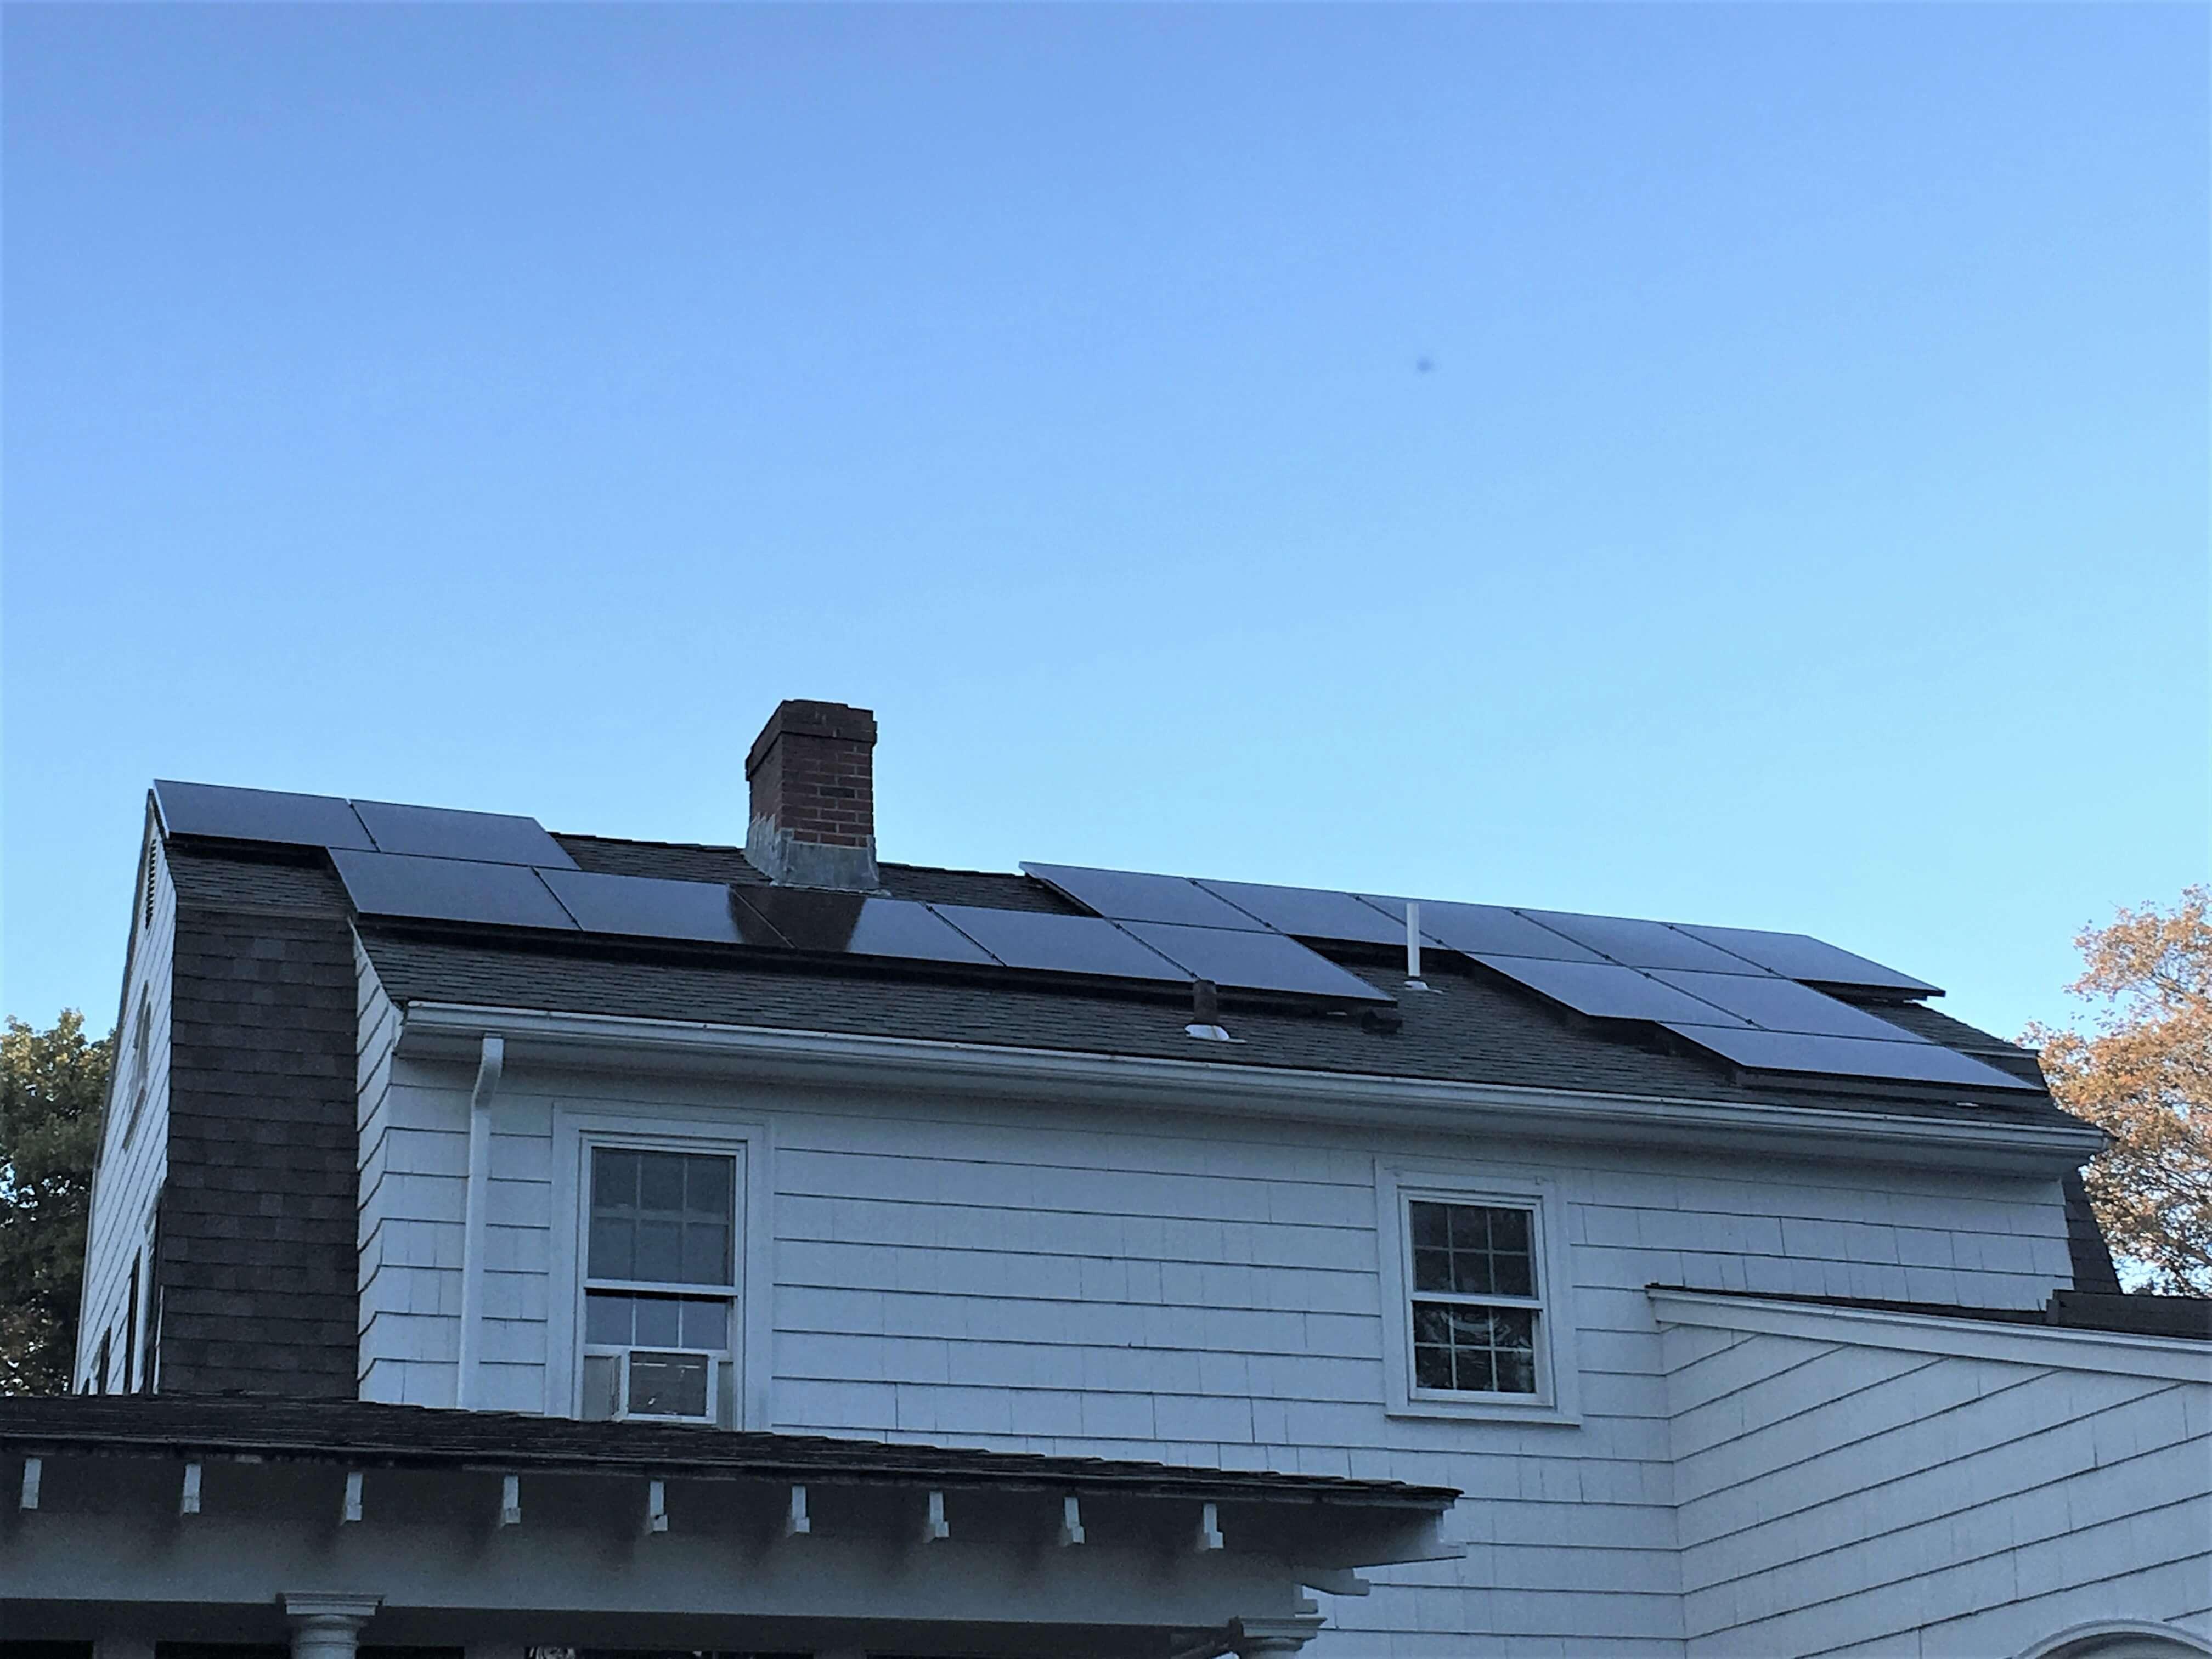 westwood massachusetts greater boston solar installation my generation energy